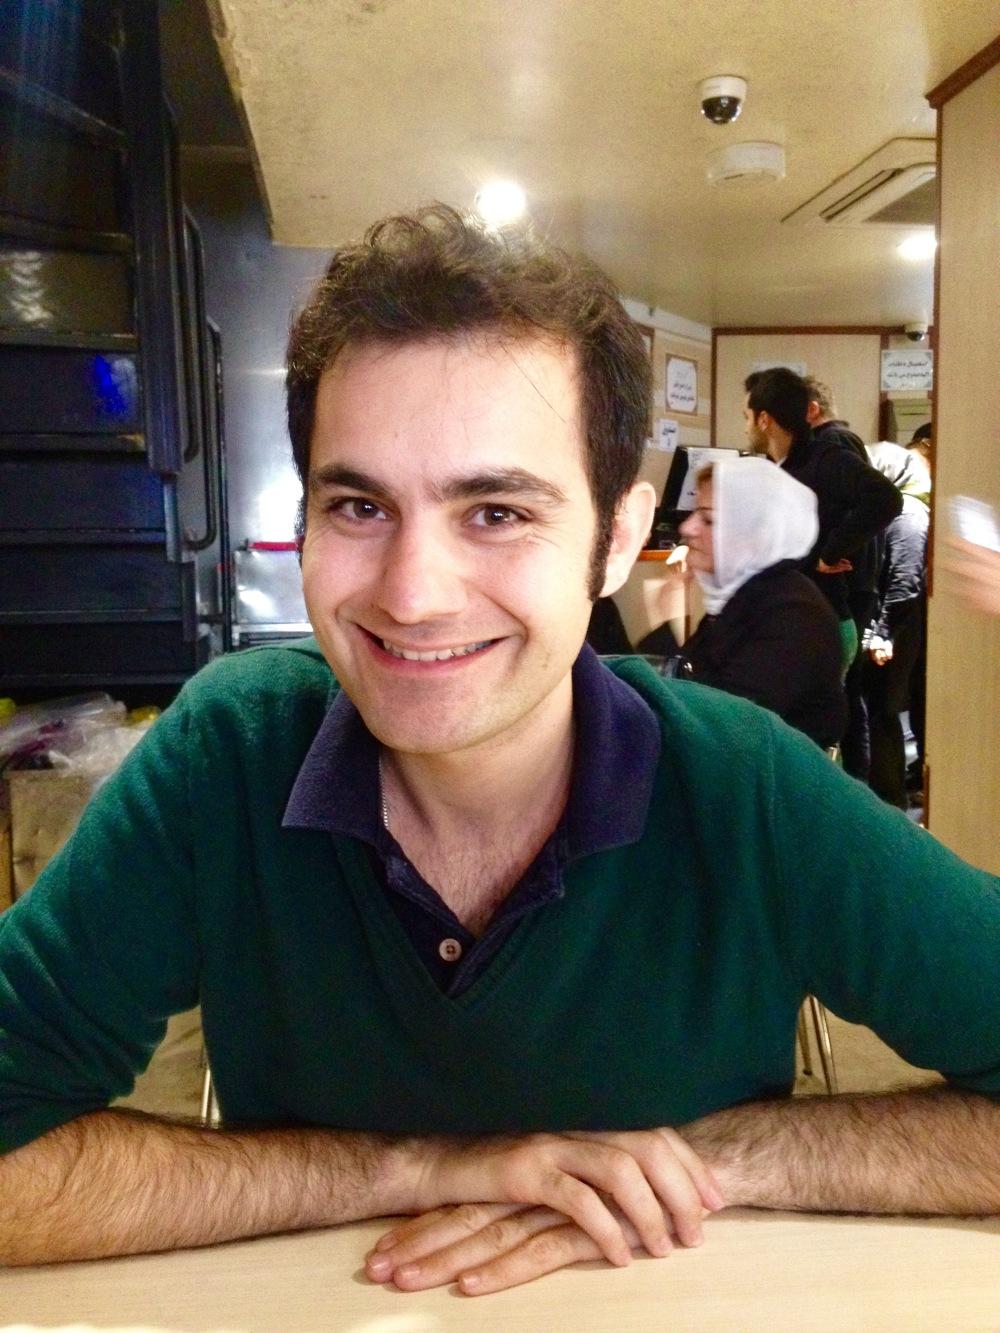 happy-ali-moslem-restaurant-tehran-iran